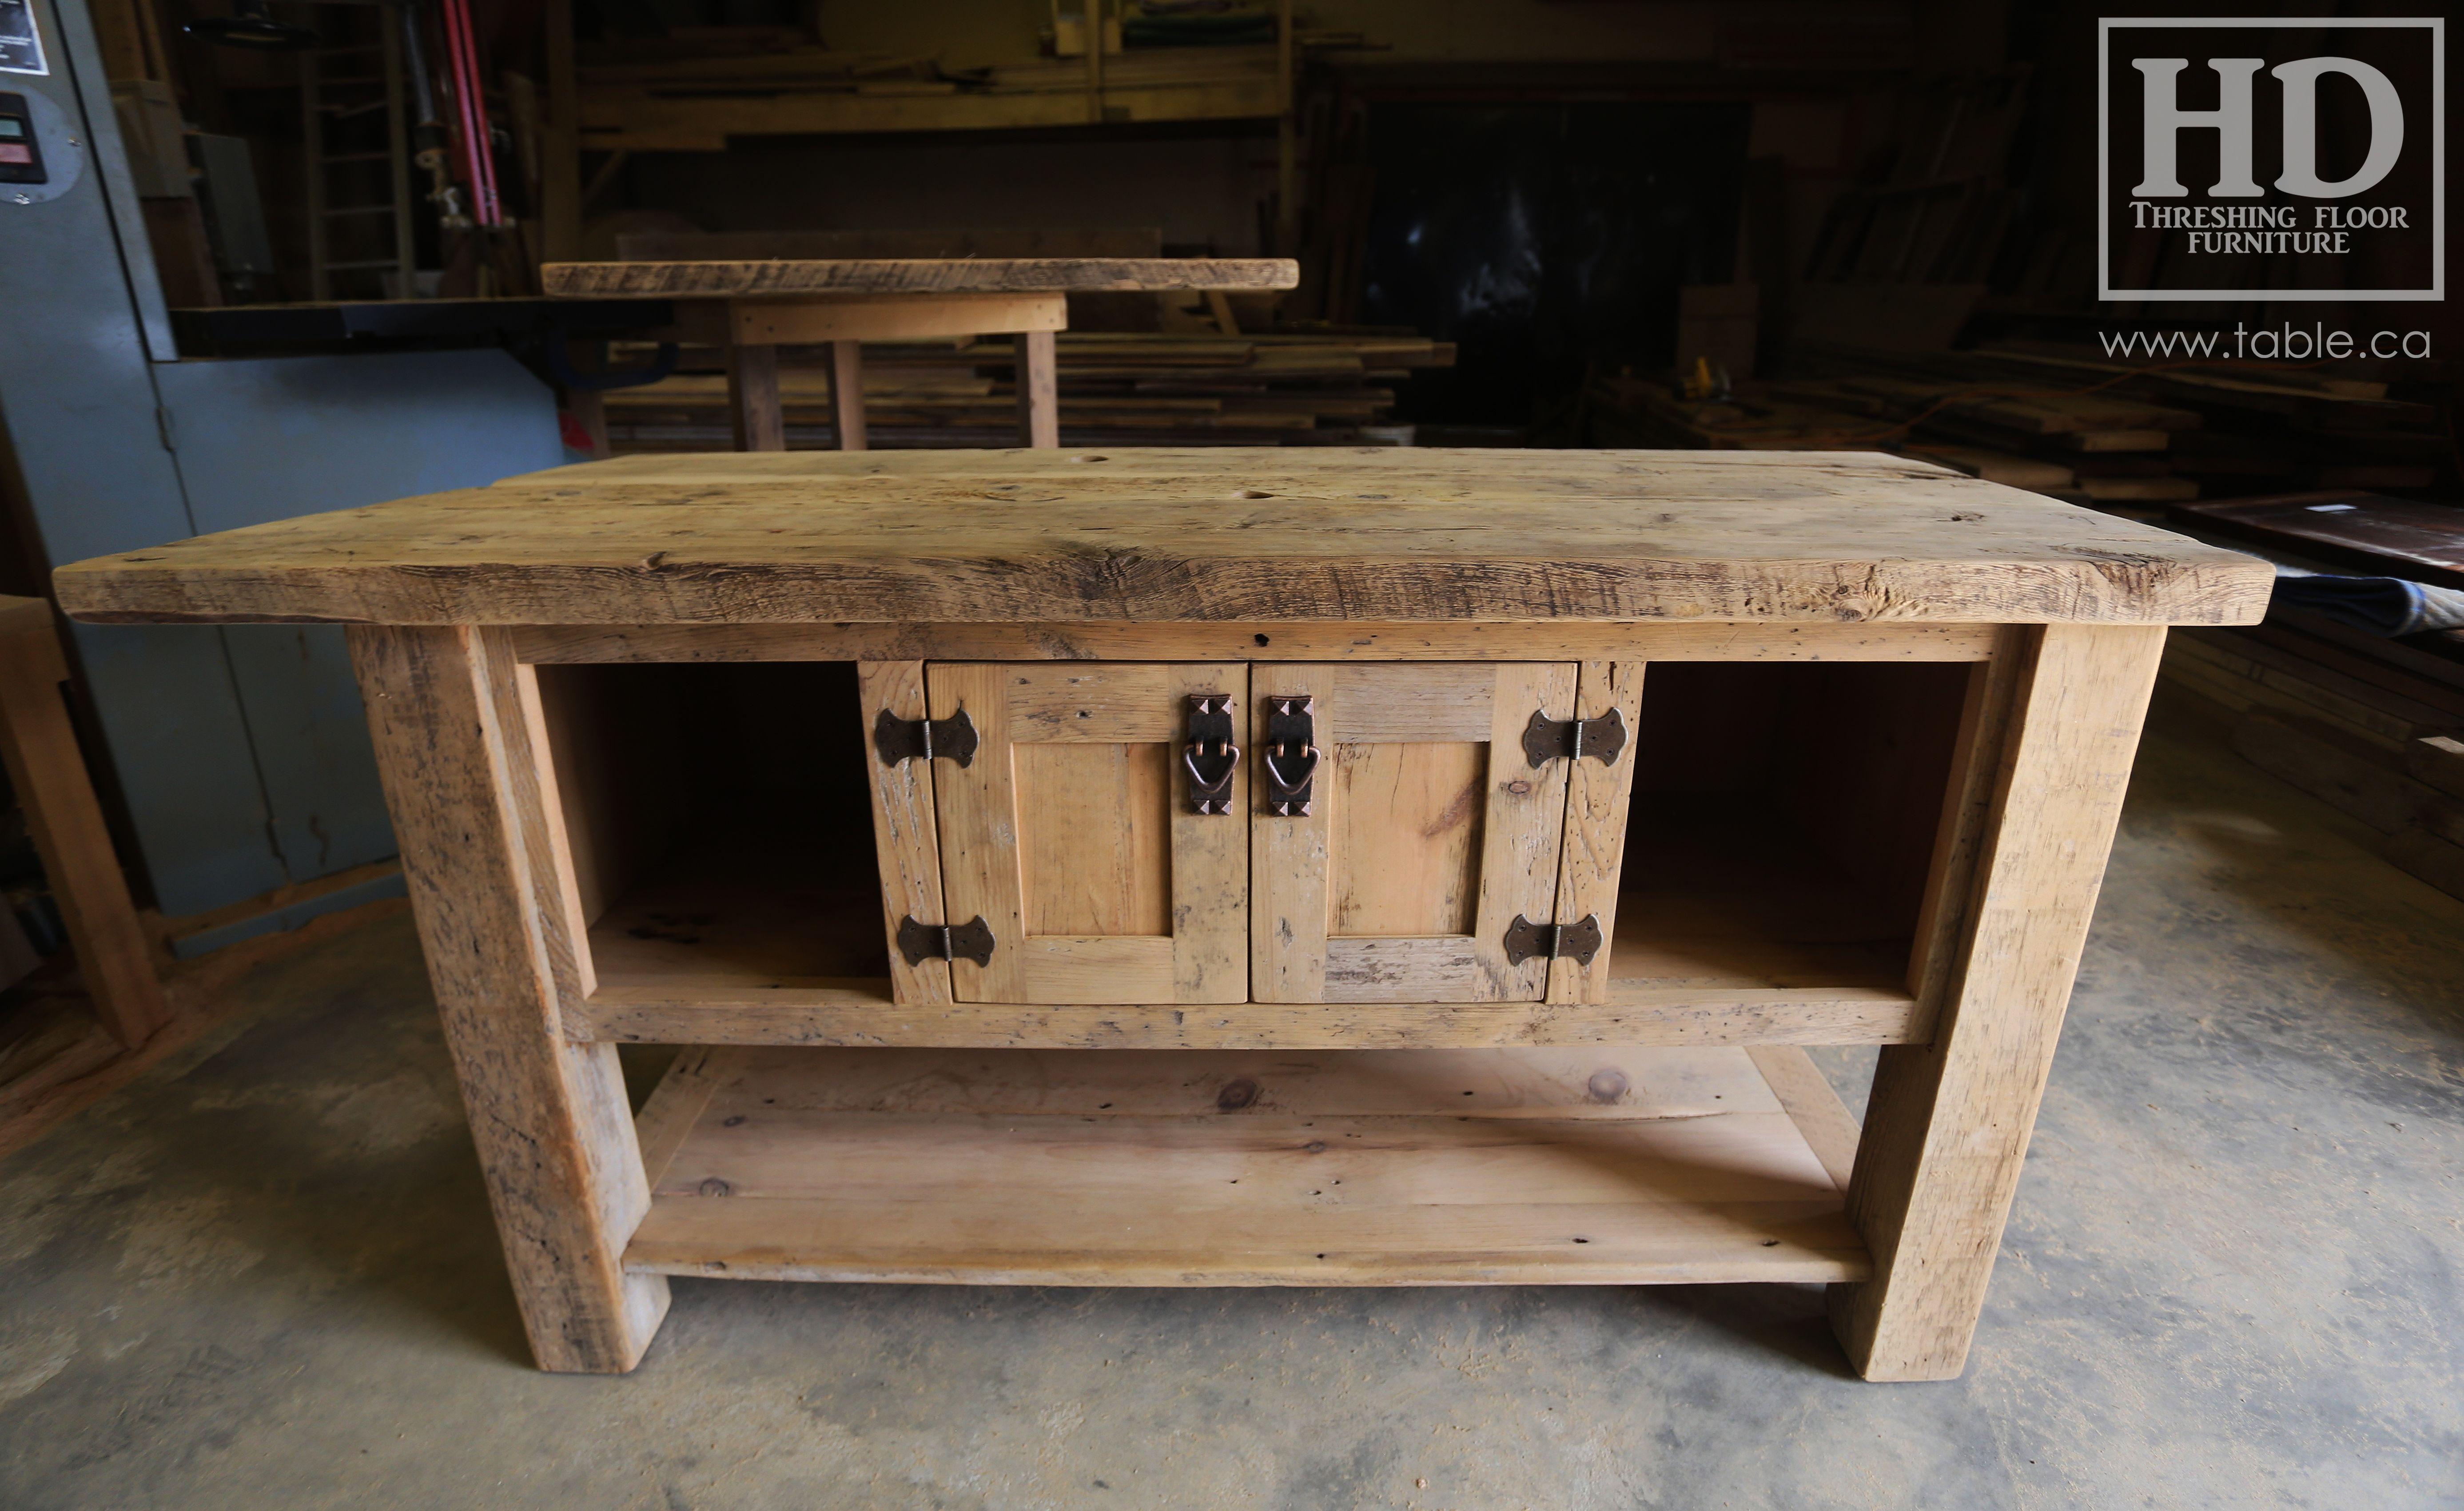 Ontario Reclaimed Wood Rustic Mennonite